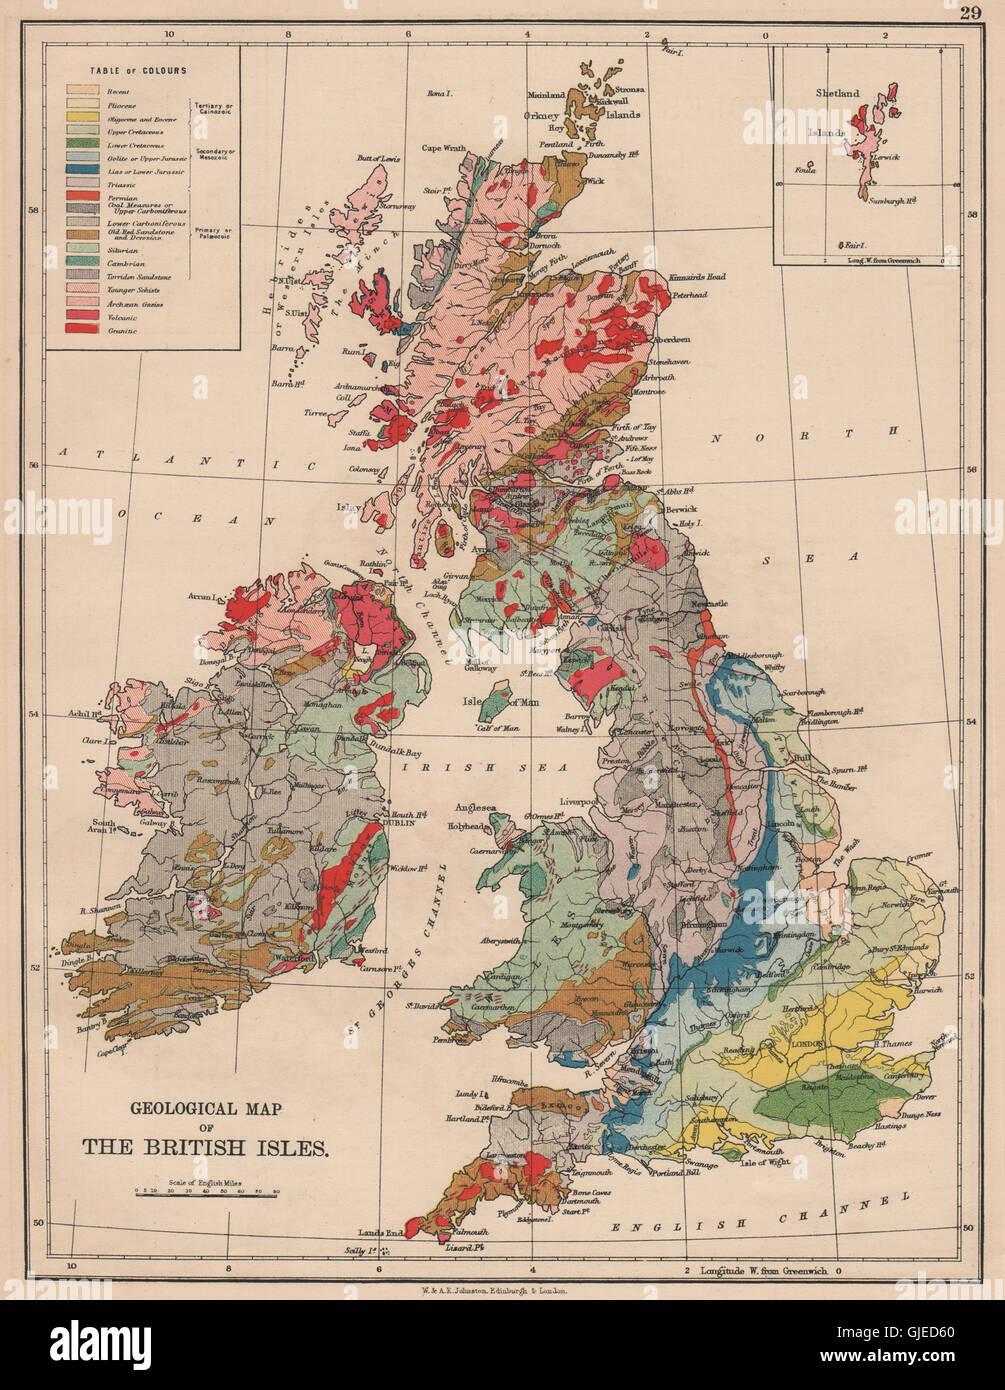 BRITISH ISLES GEOLOGICAL. Pliocene Cretaceous Jurassic Triassic &c, 1906 map - Stock Image